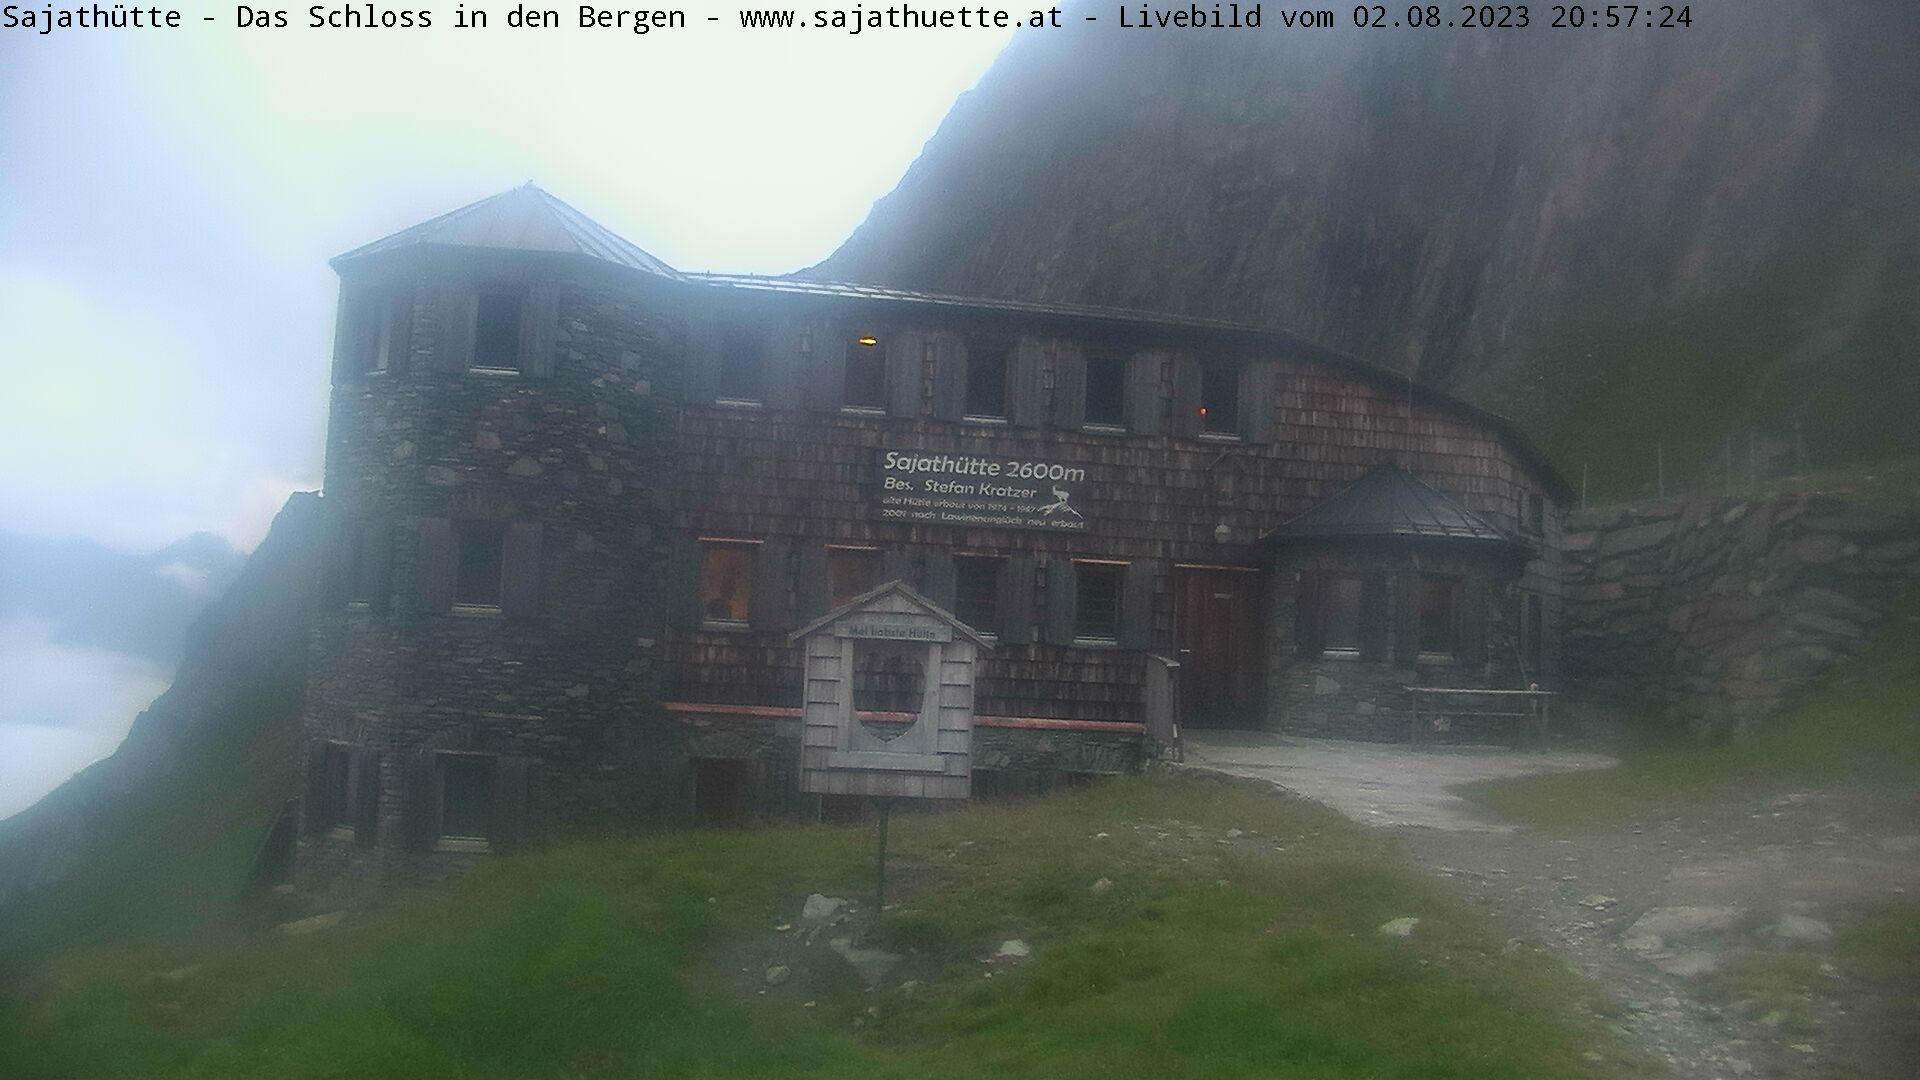 Webcam Webcam Sajathütte - Aktuelles Live-Bild aus 2.600m Seehöhe